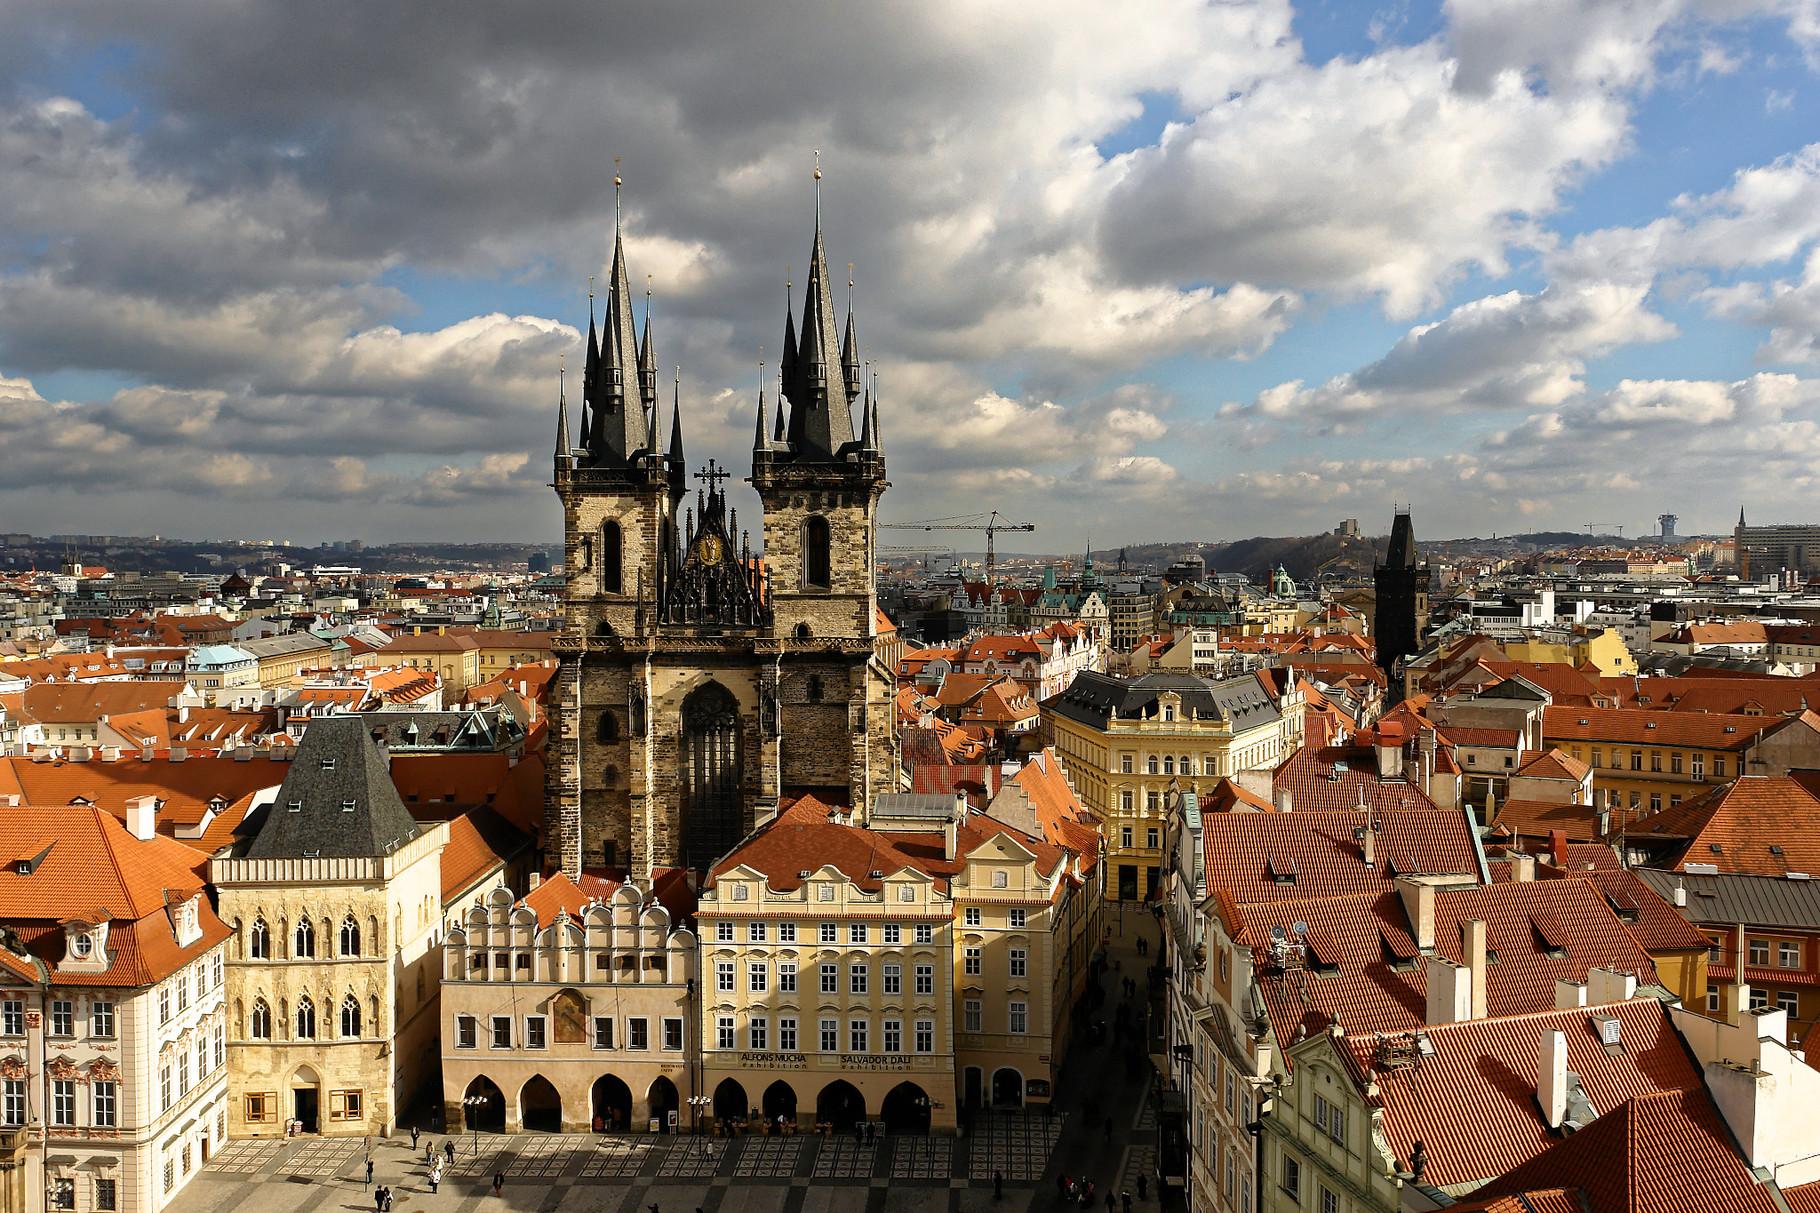 Prag 2007 - Luposalbum - Reisefotos von Stefan Lubs